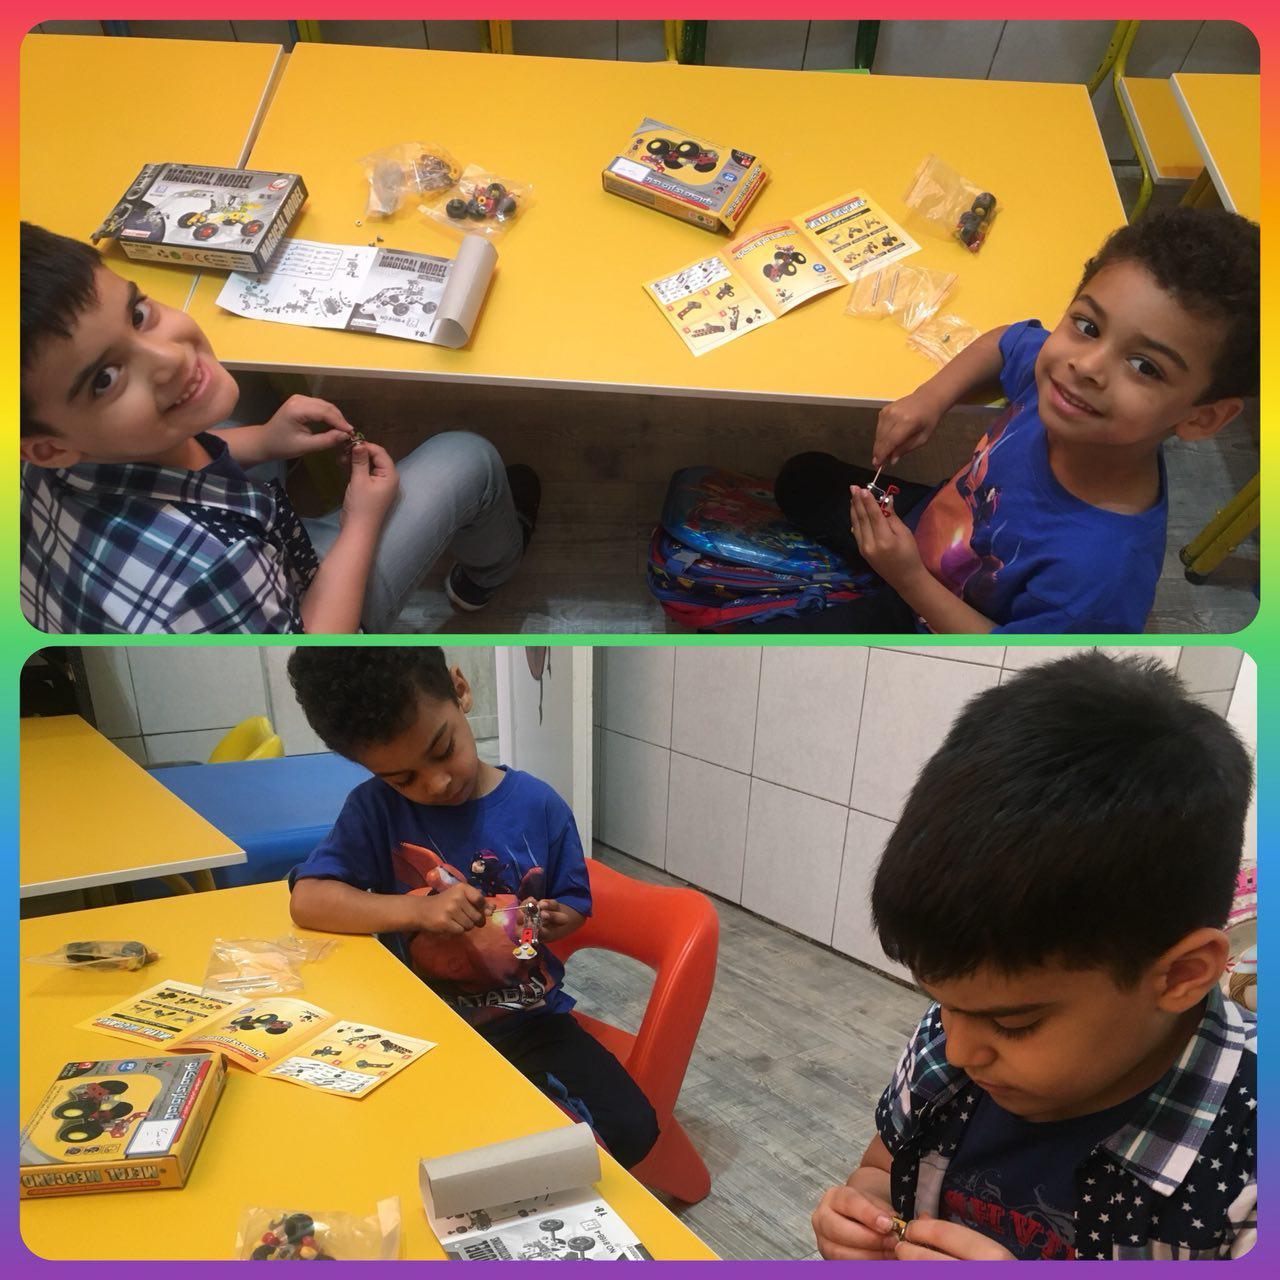 کلاس خصوصی روباتیک مهد کودک سهیل